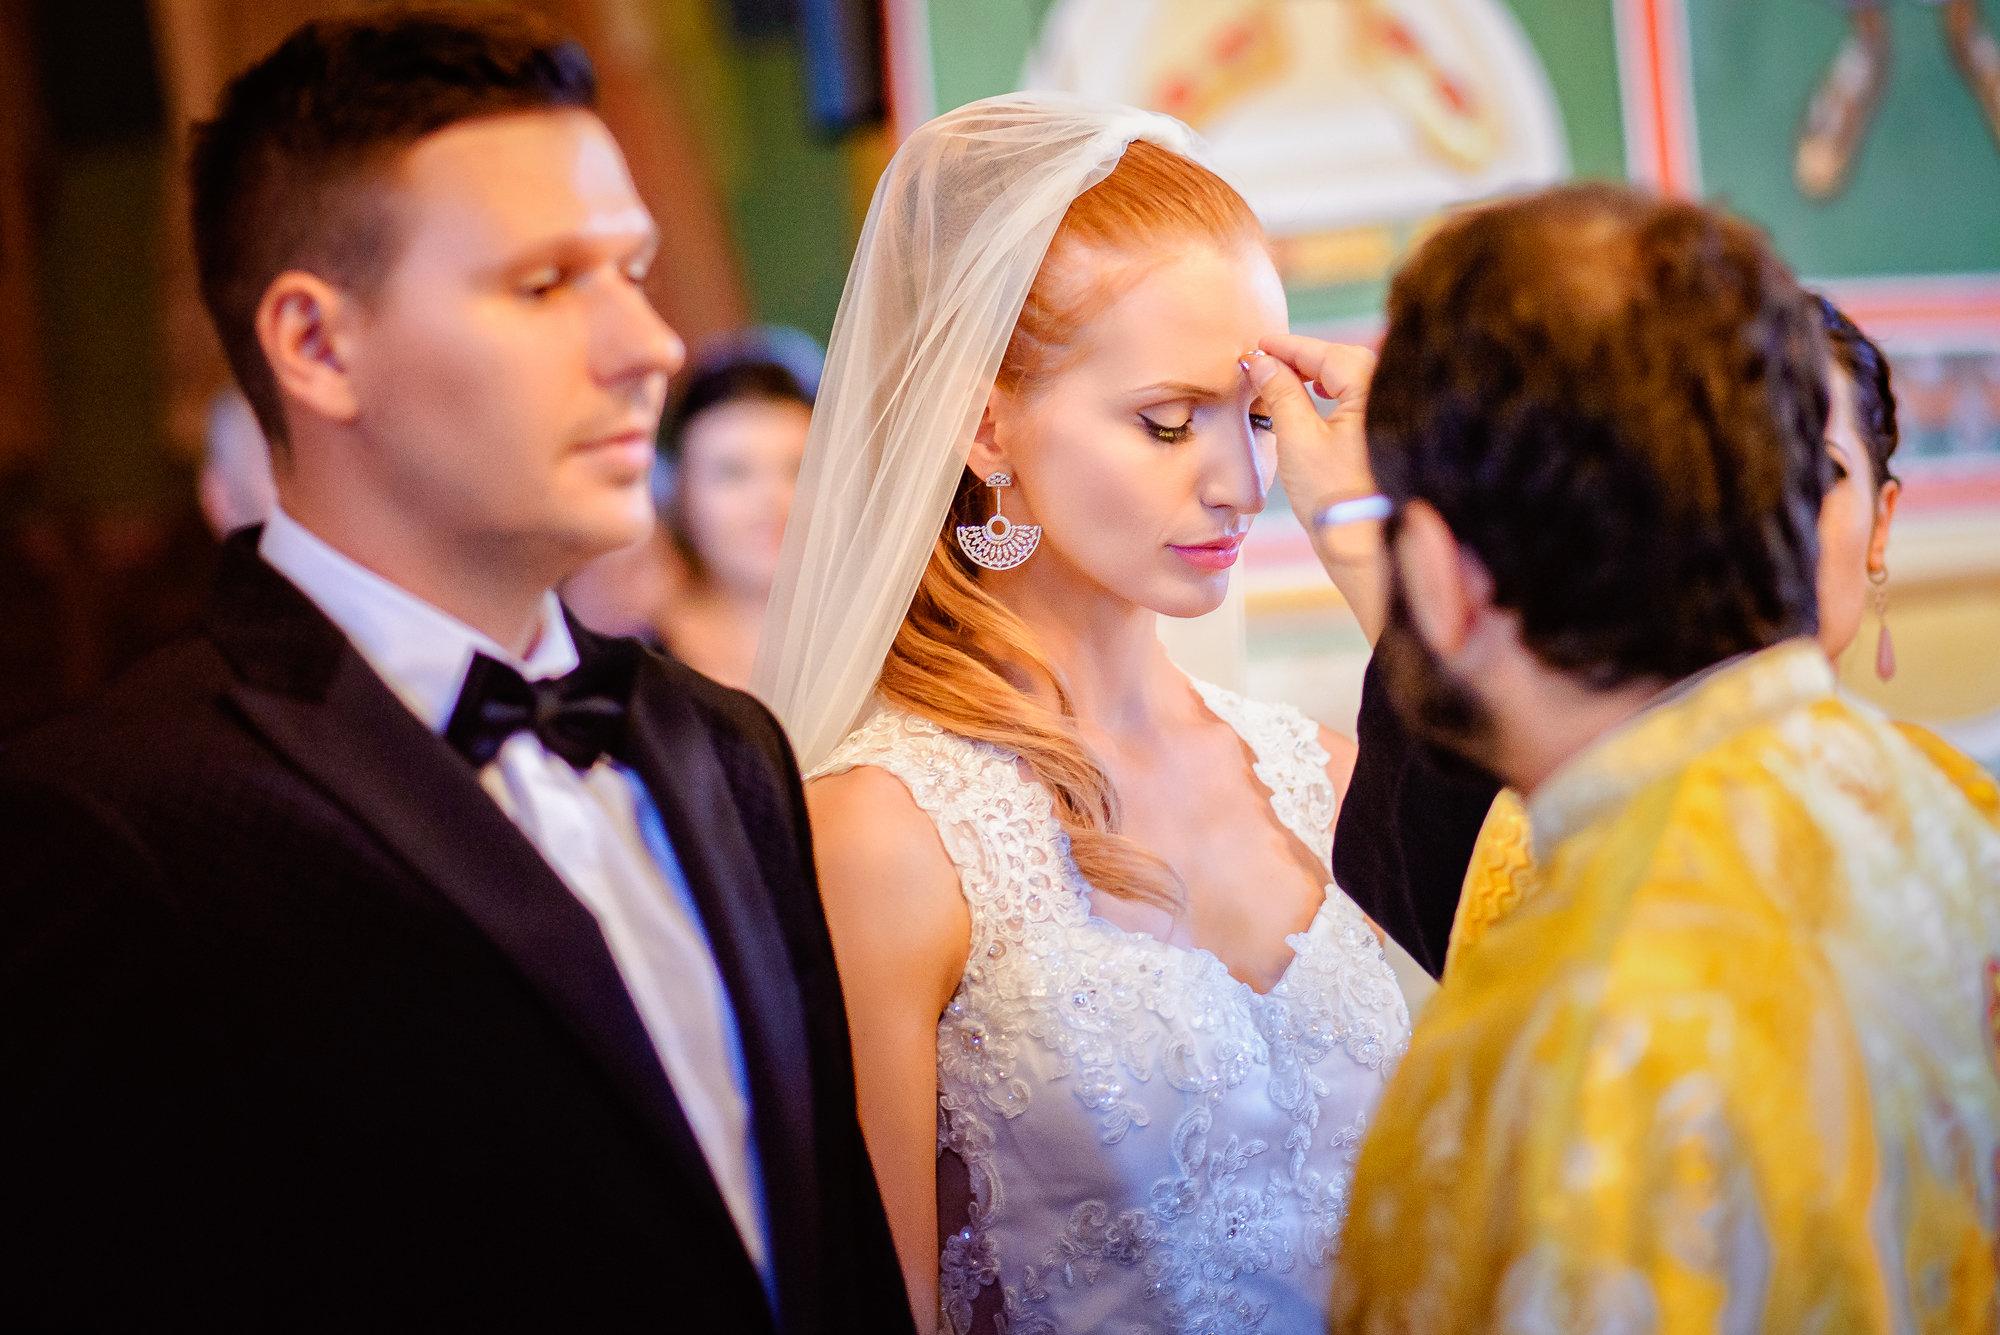 alexandru madalina wedding day 15